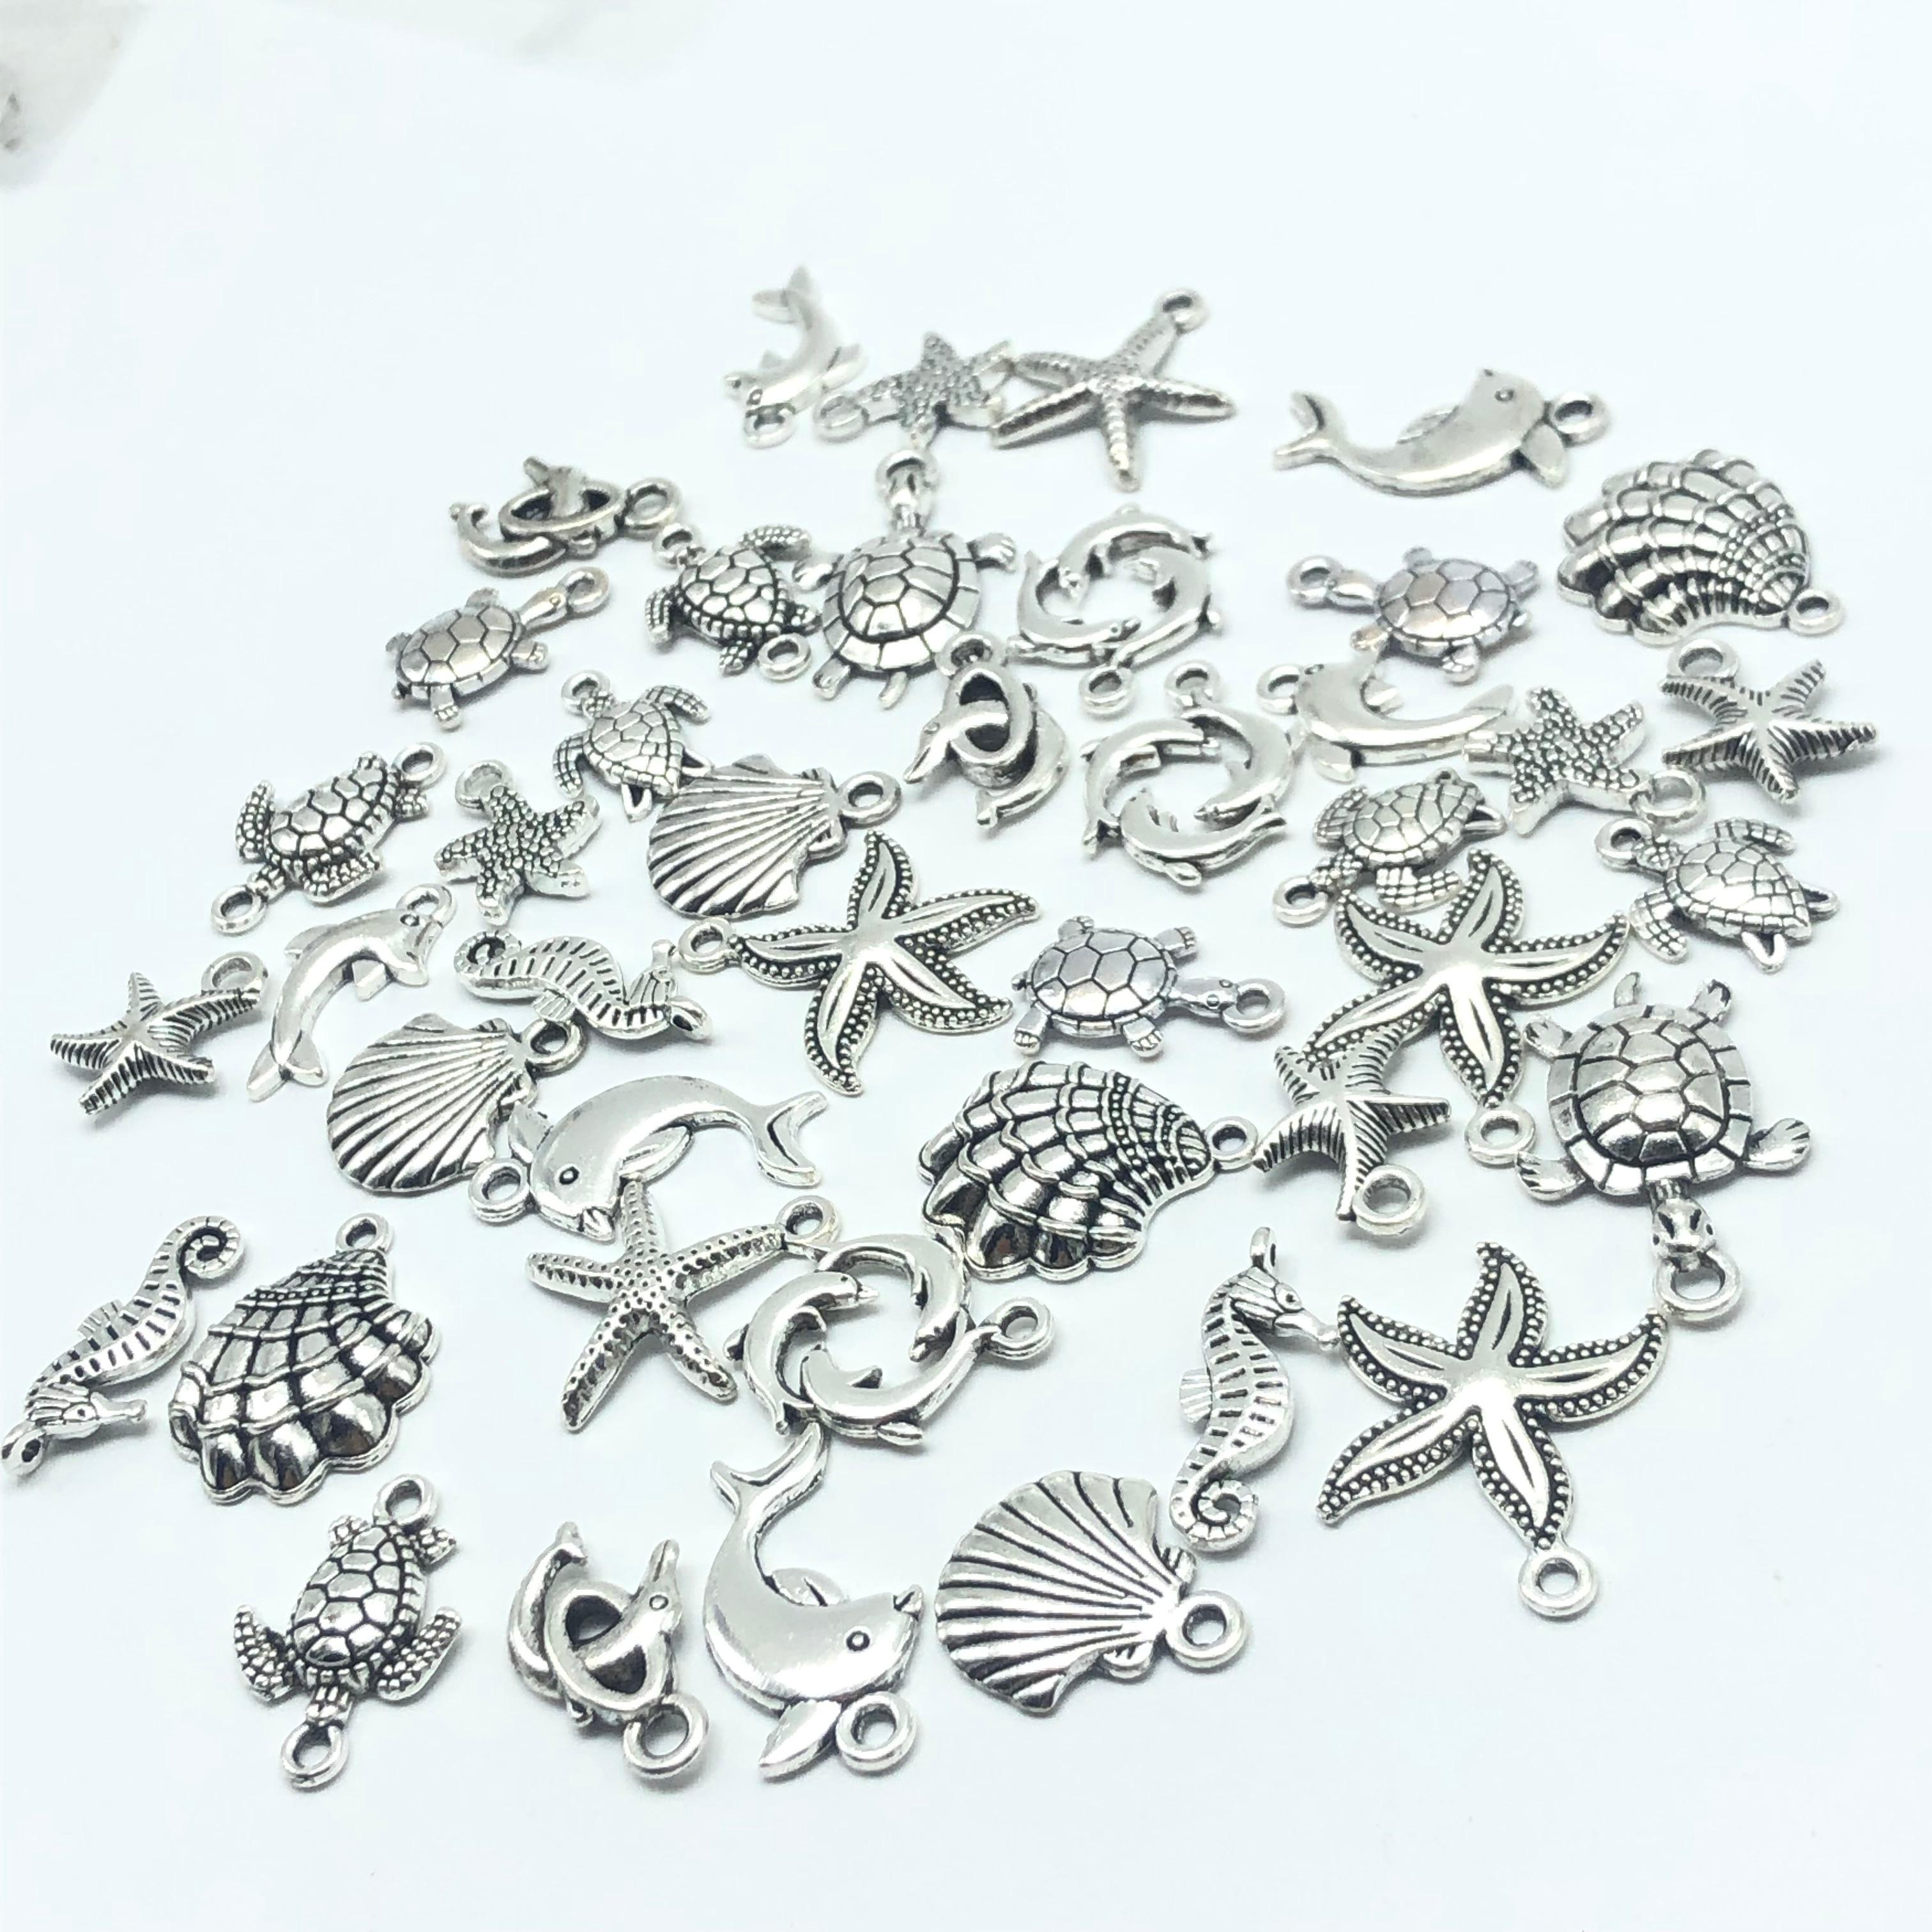 30pcs Mixed batch Tibetan silver starfish Sea turtles shell dolphins tortoise hippocampus Charm pendant jewellery findings недорого